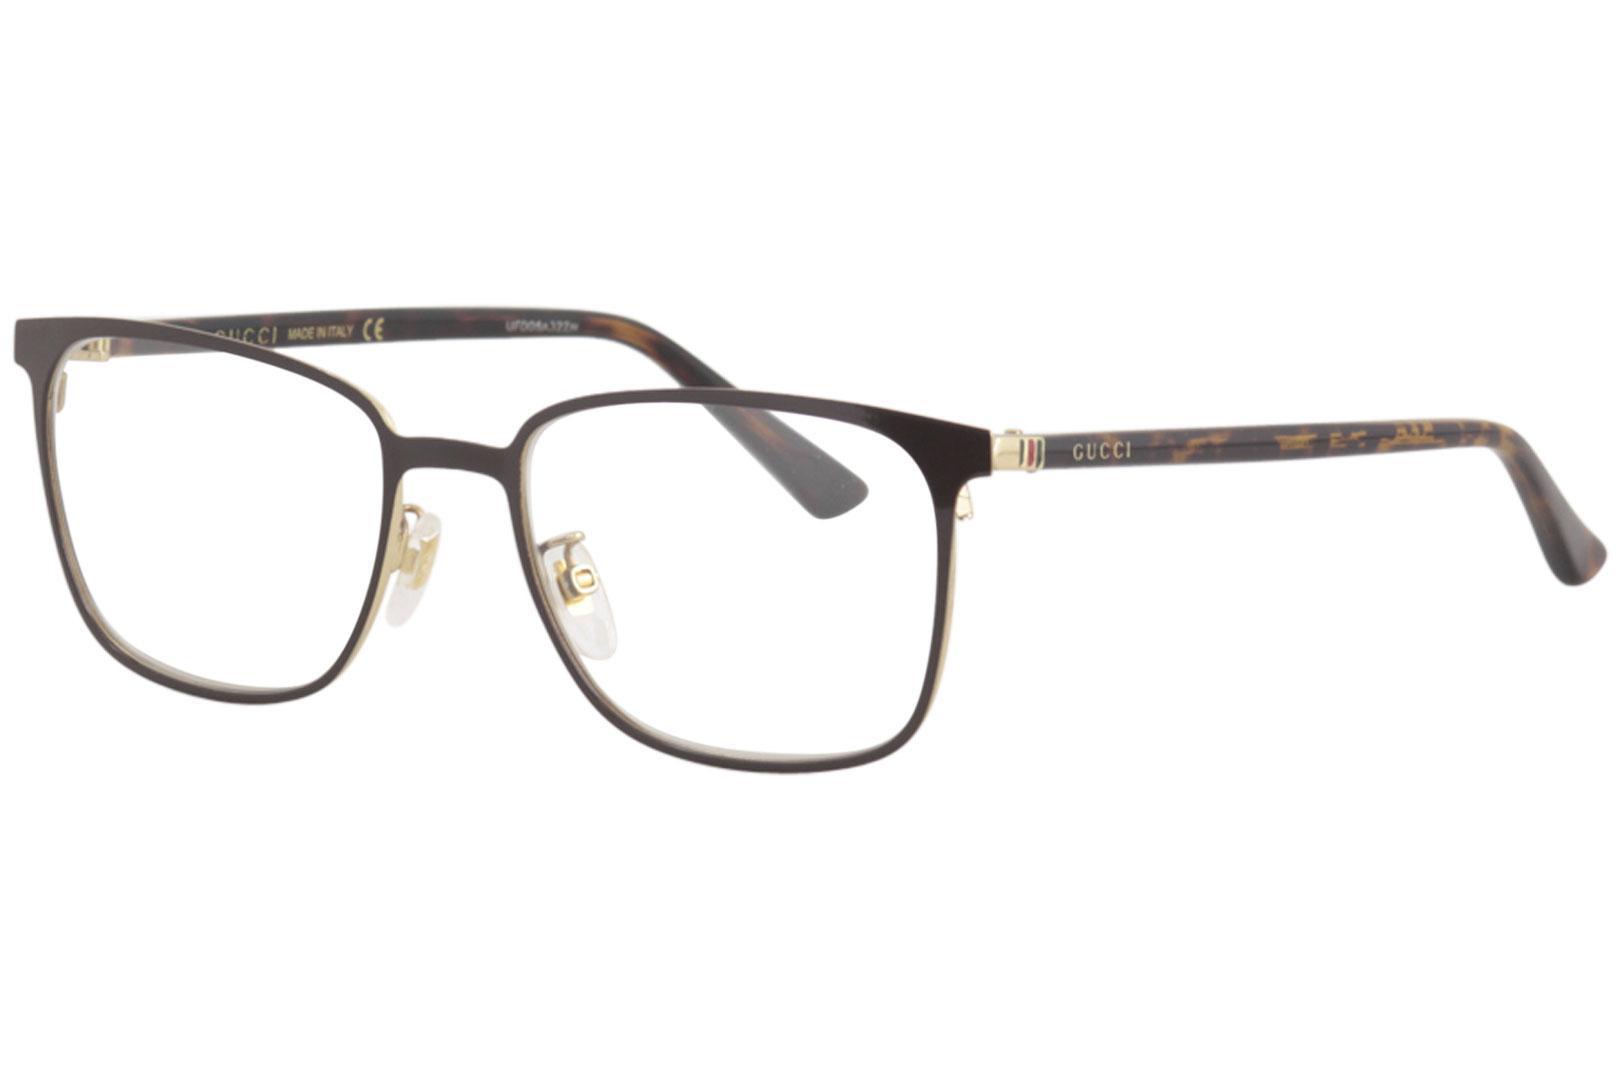 Gucci men sensual romantic eyeglasses o full rim optical frame jpg  1620x1080 Gucci eyeglasses men 45431cbe52e